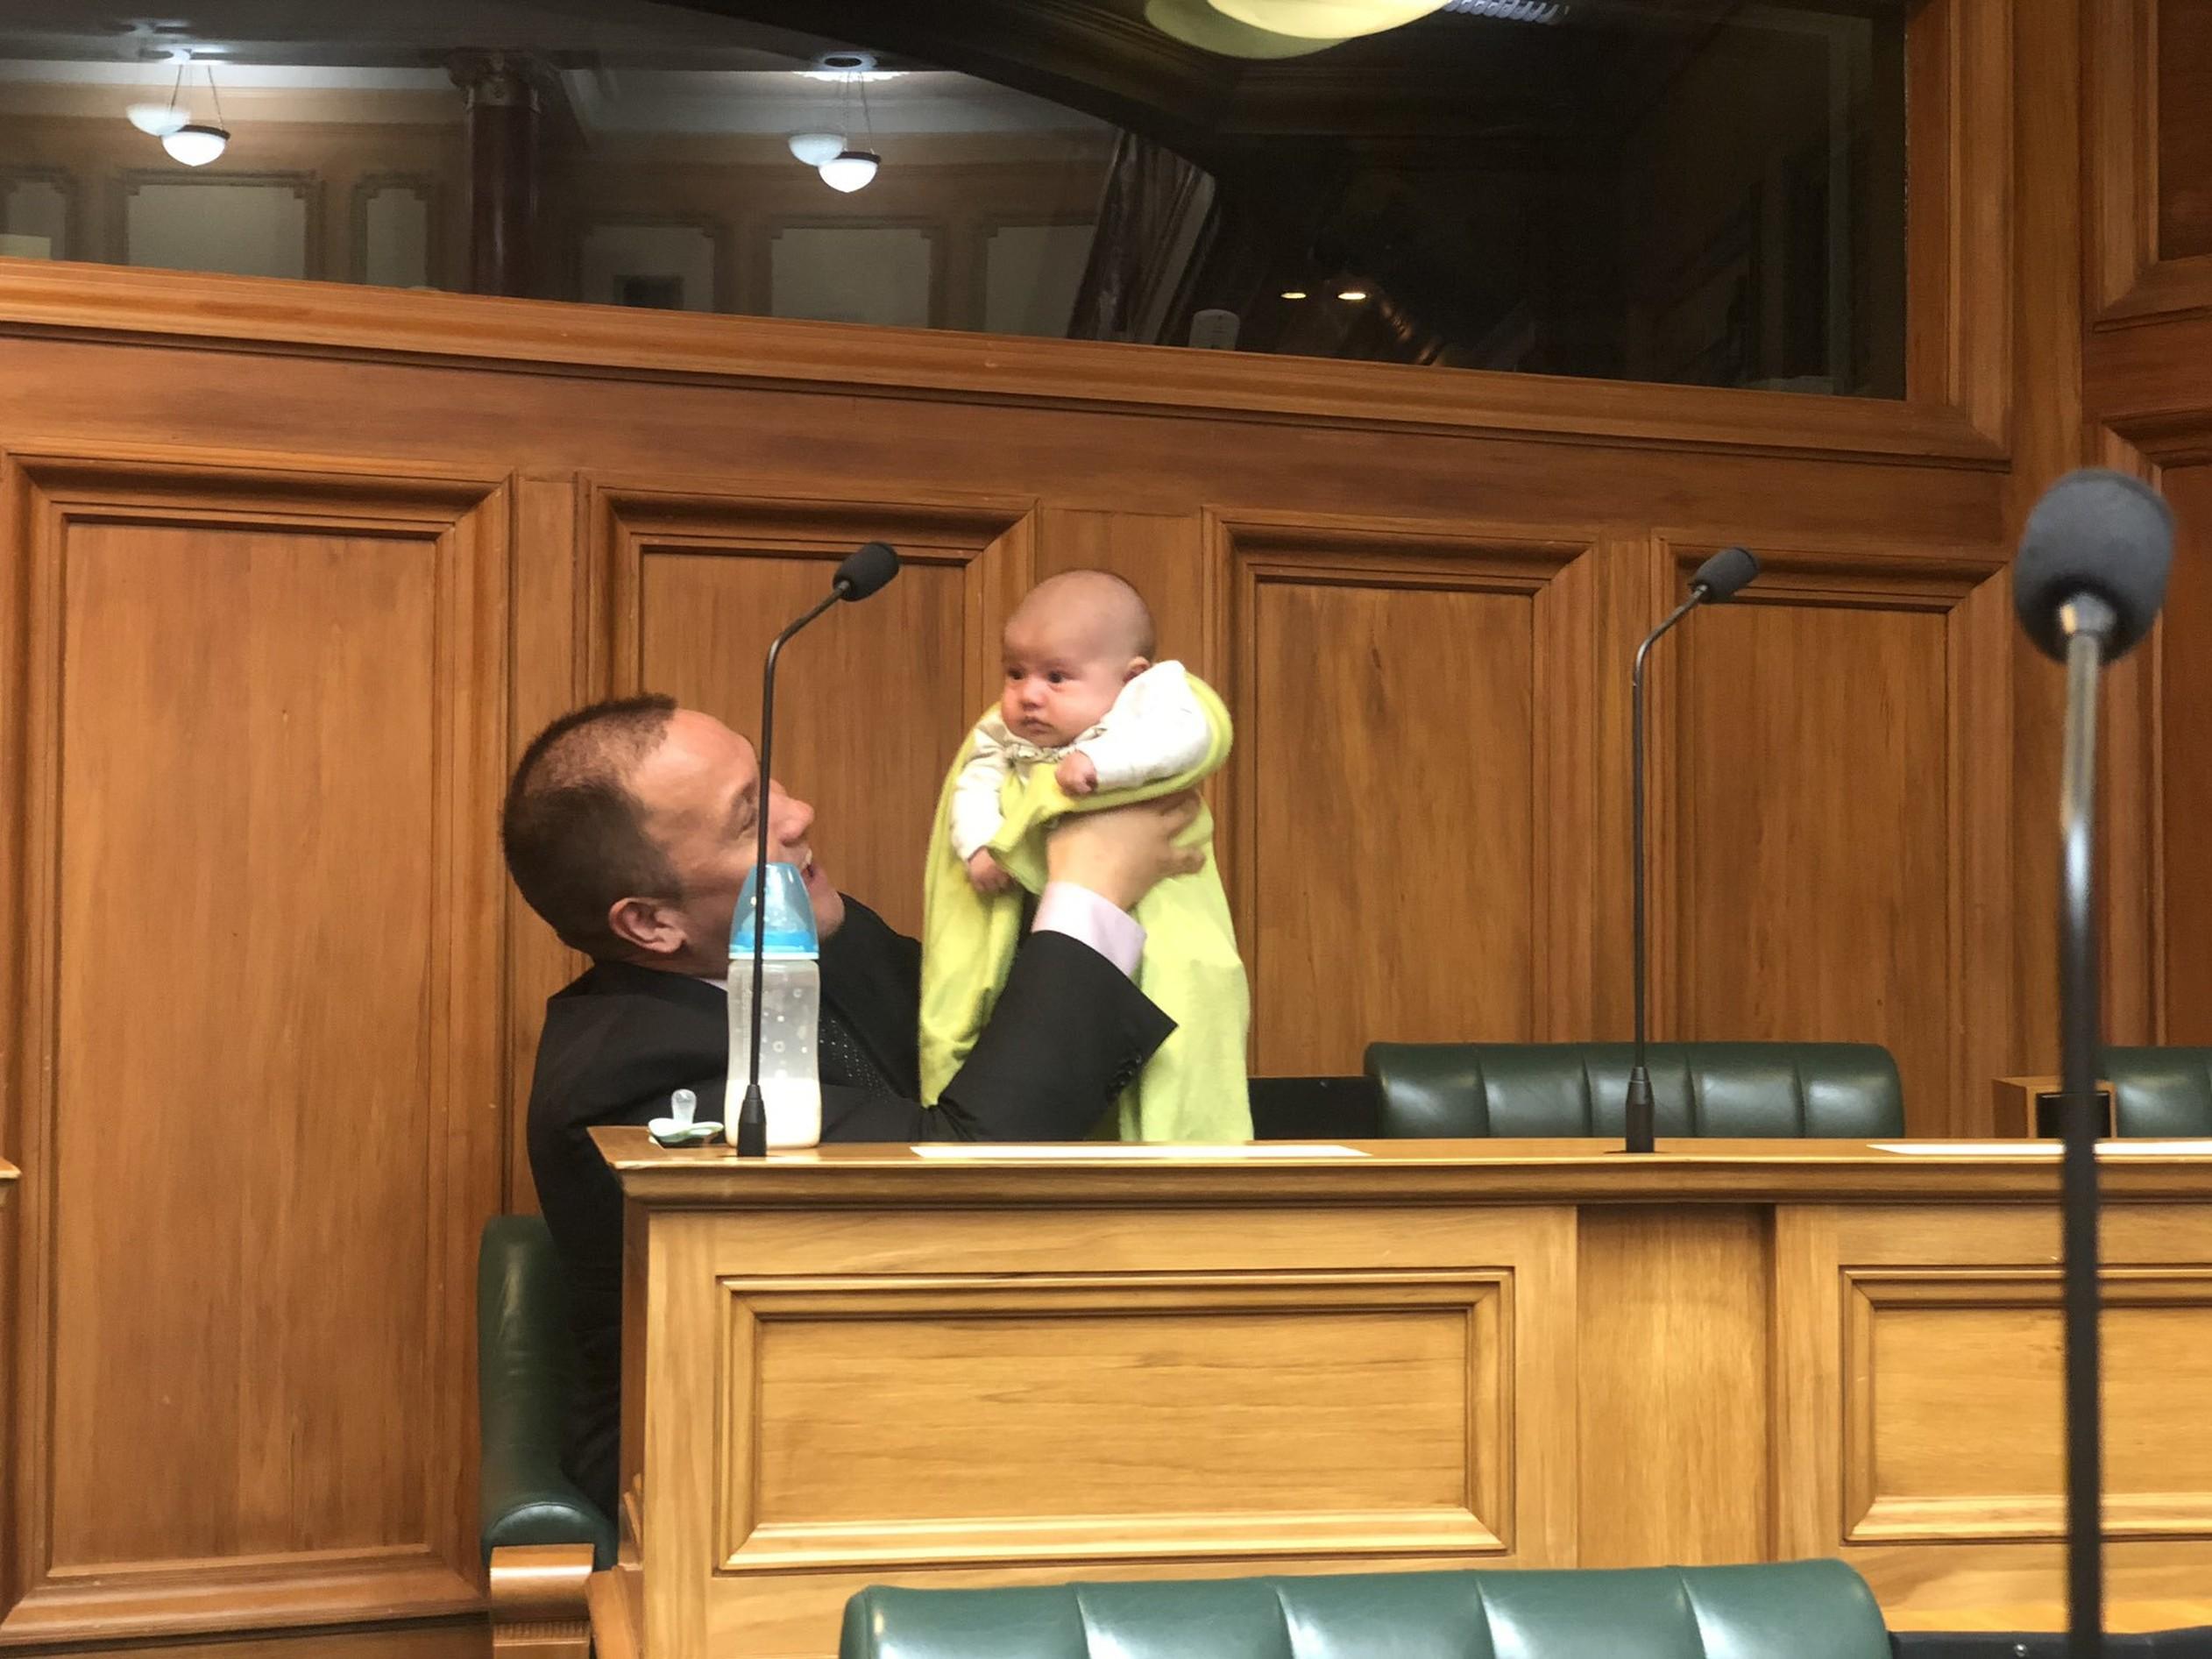 presidente parlamento nova zelândia cuida bebê debate